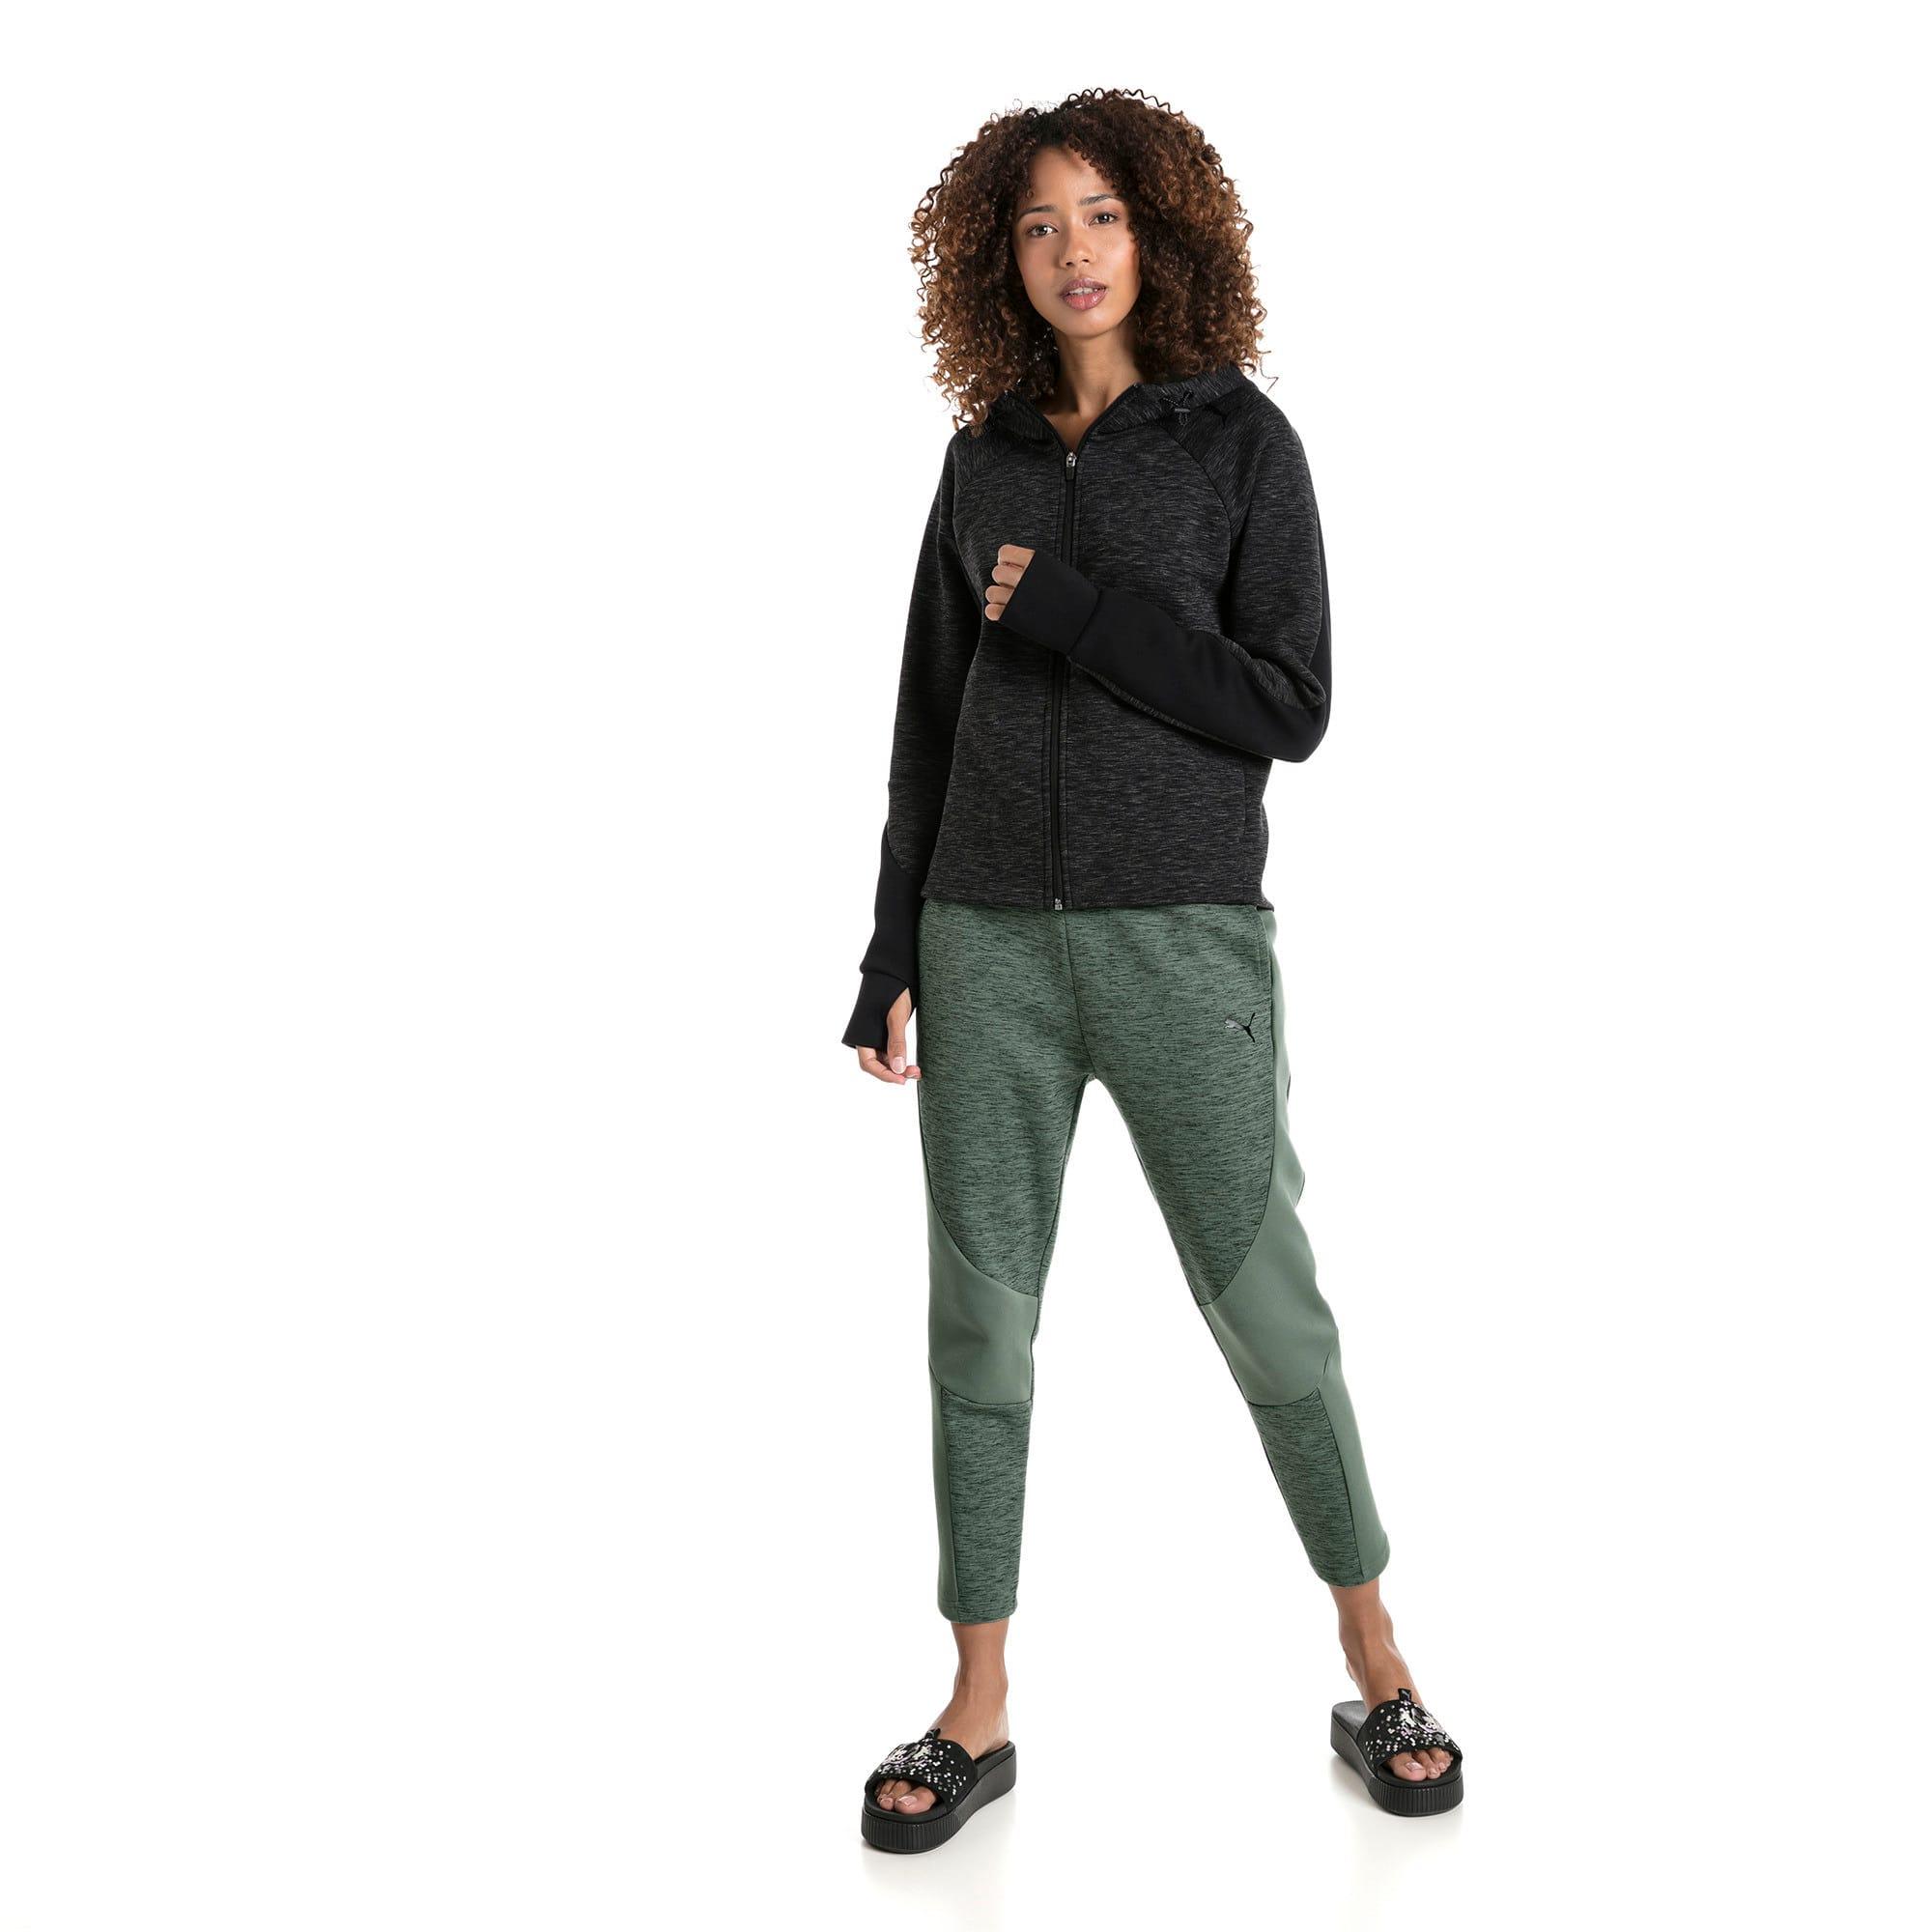 Thumbnail 5 of Evostripe hoodie met rits voor dames, Cotton Black-heather, medium